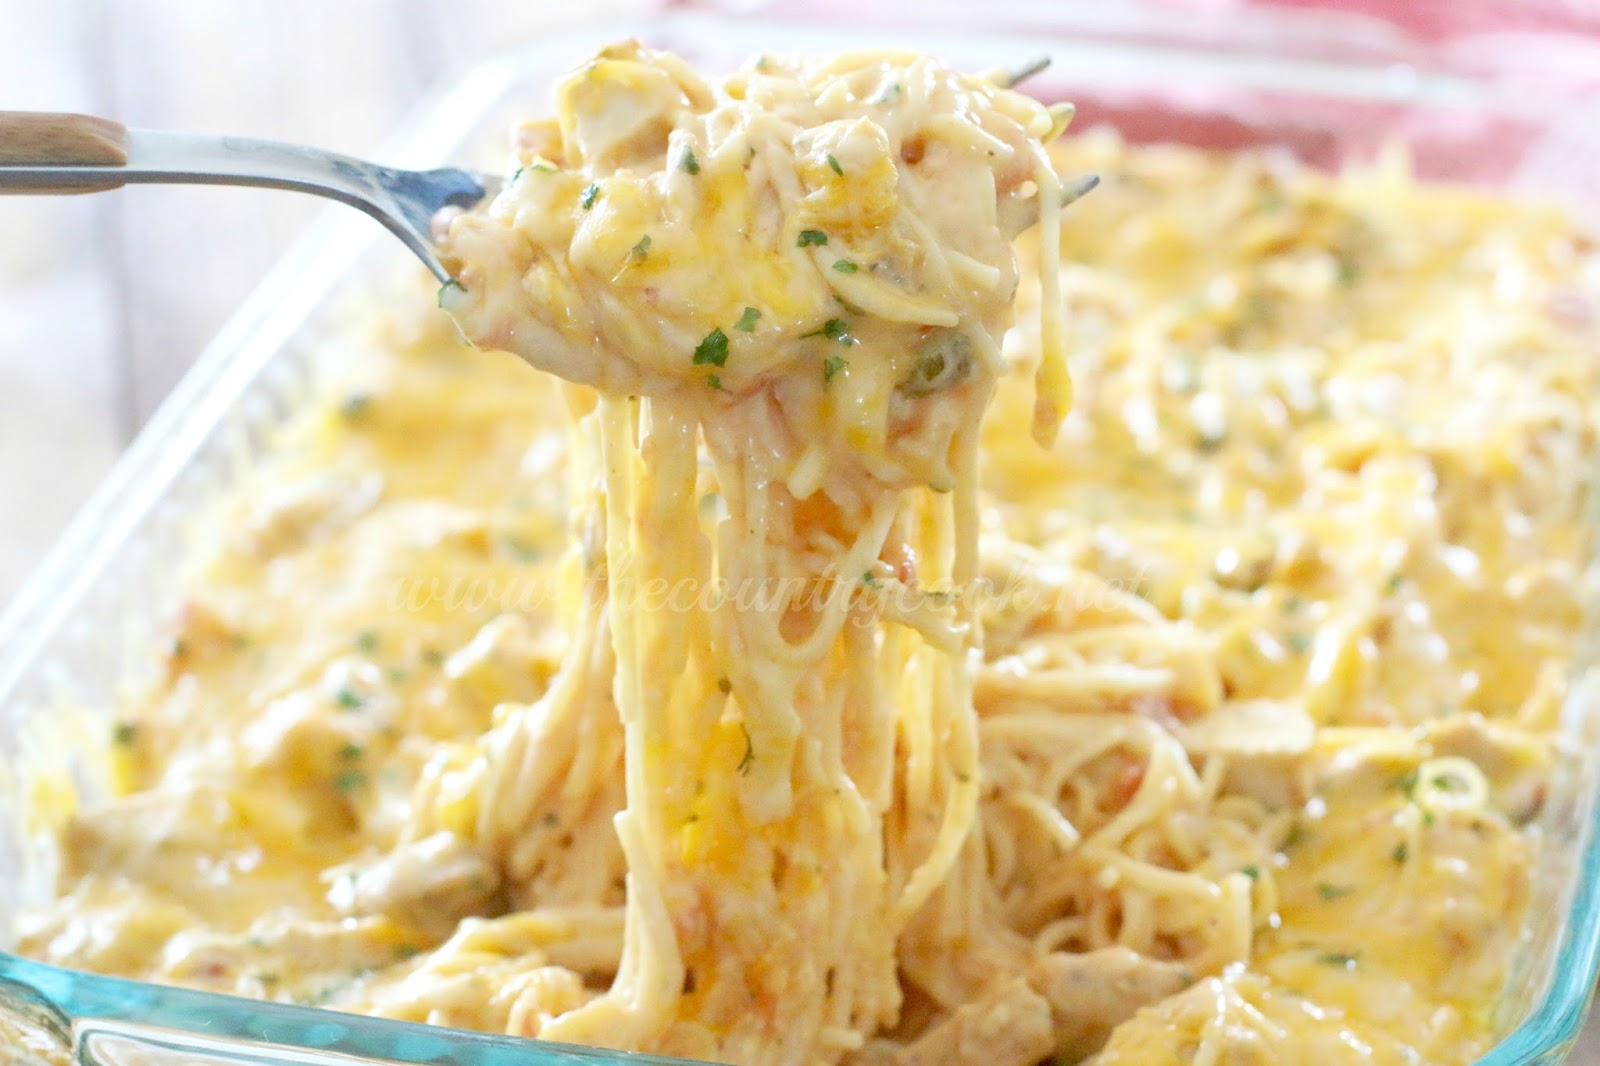 Creamy, Cheesy Chicken Spaghetti - The Country Cook